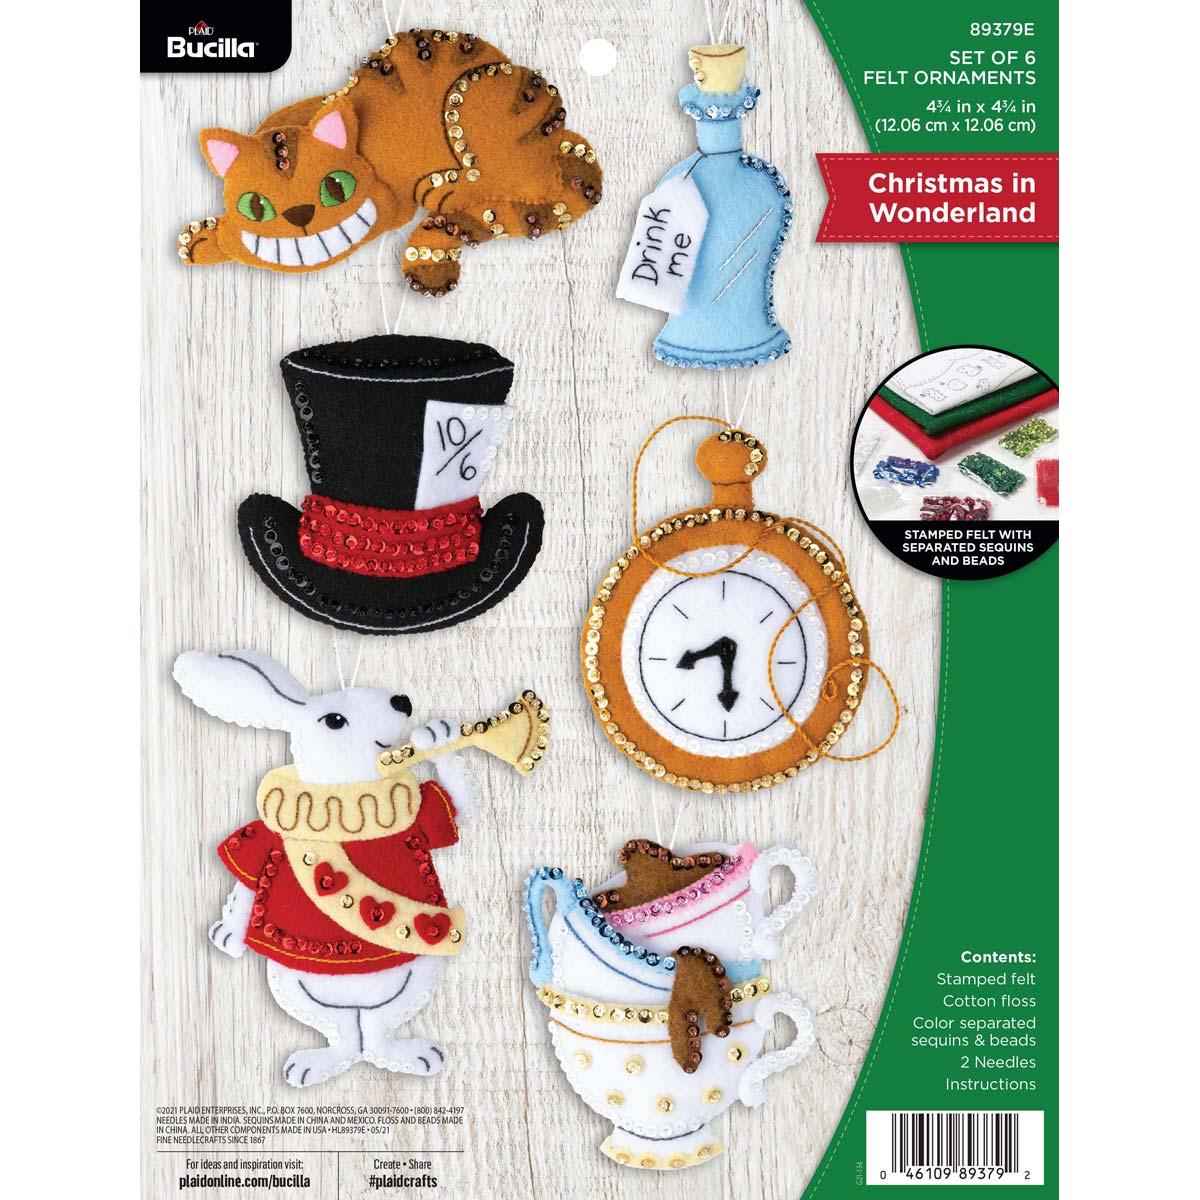 Bucilla ® Seasonal - Felt - Ornament Kits - Christmas in Wonderland - 89379E